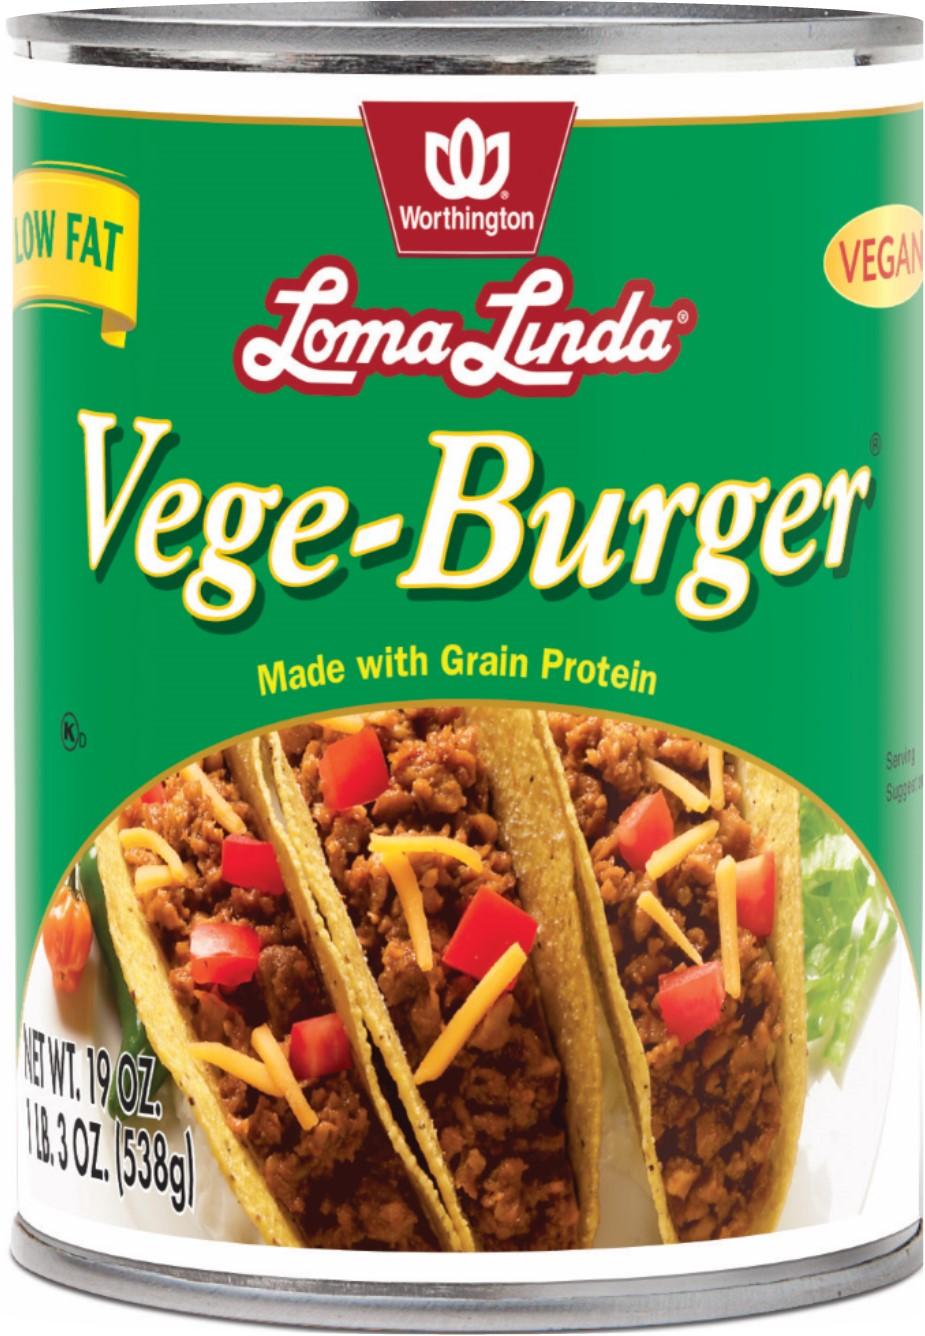 VEGE BURGER LOW FAT LOMA LINDA CASE,LOMA LINDA LF,100055